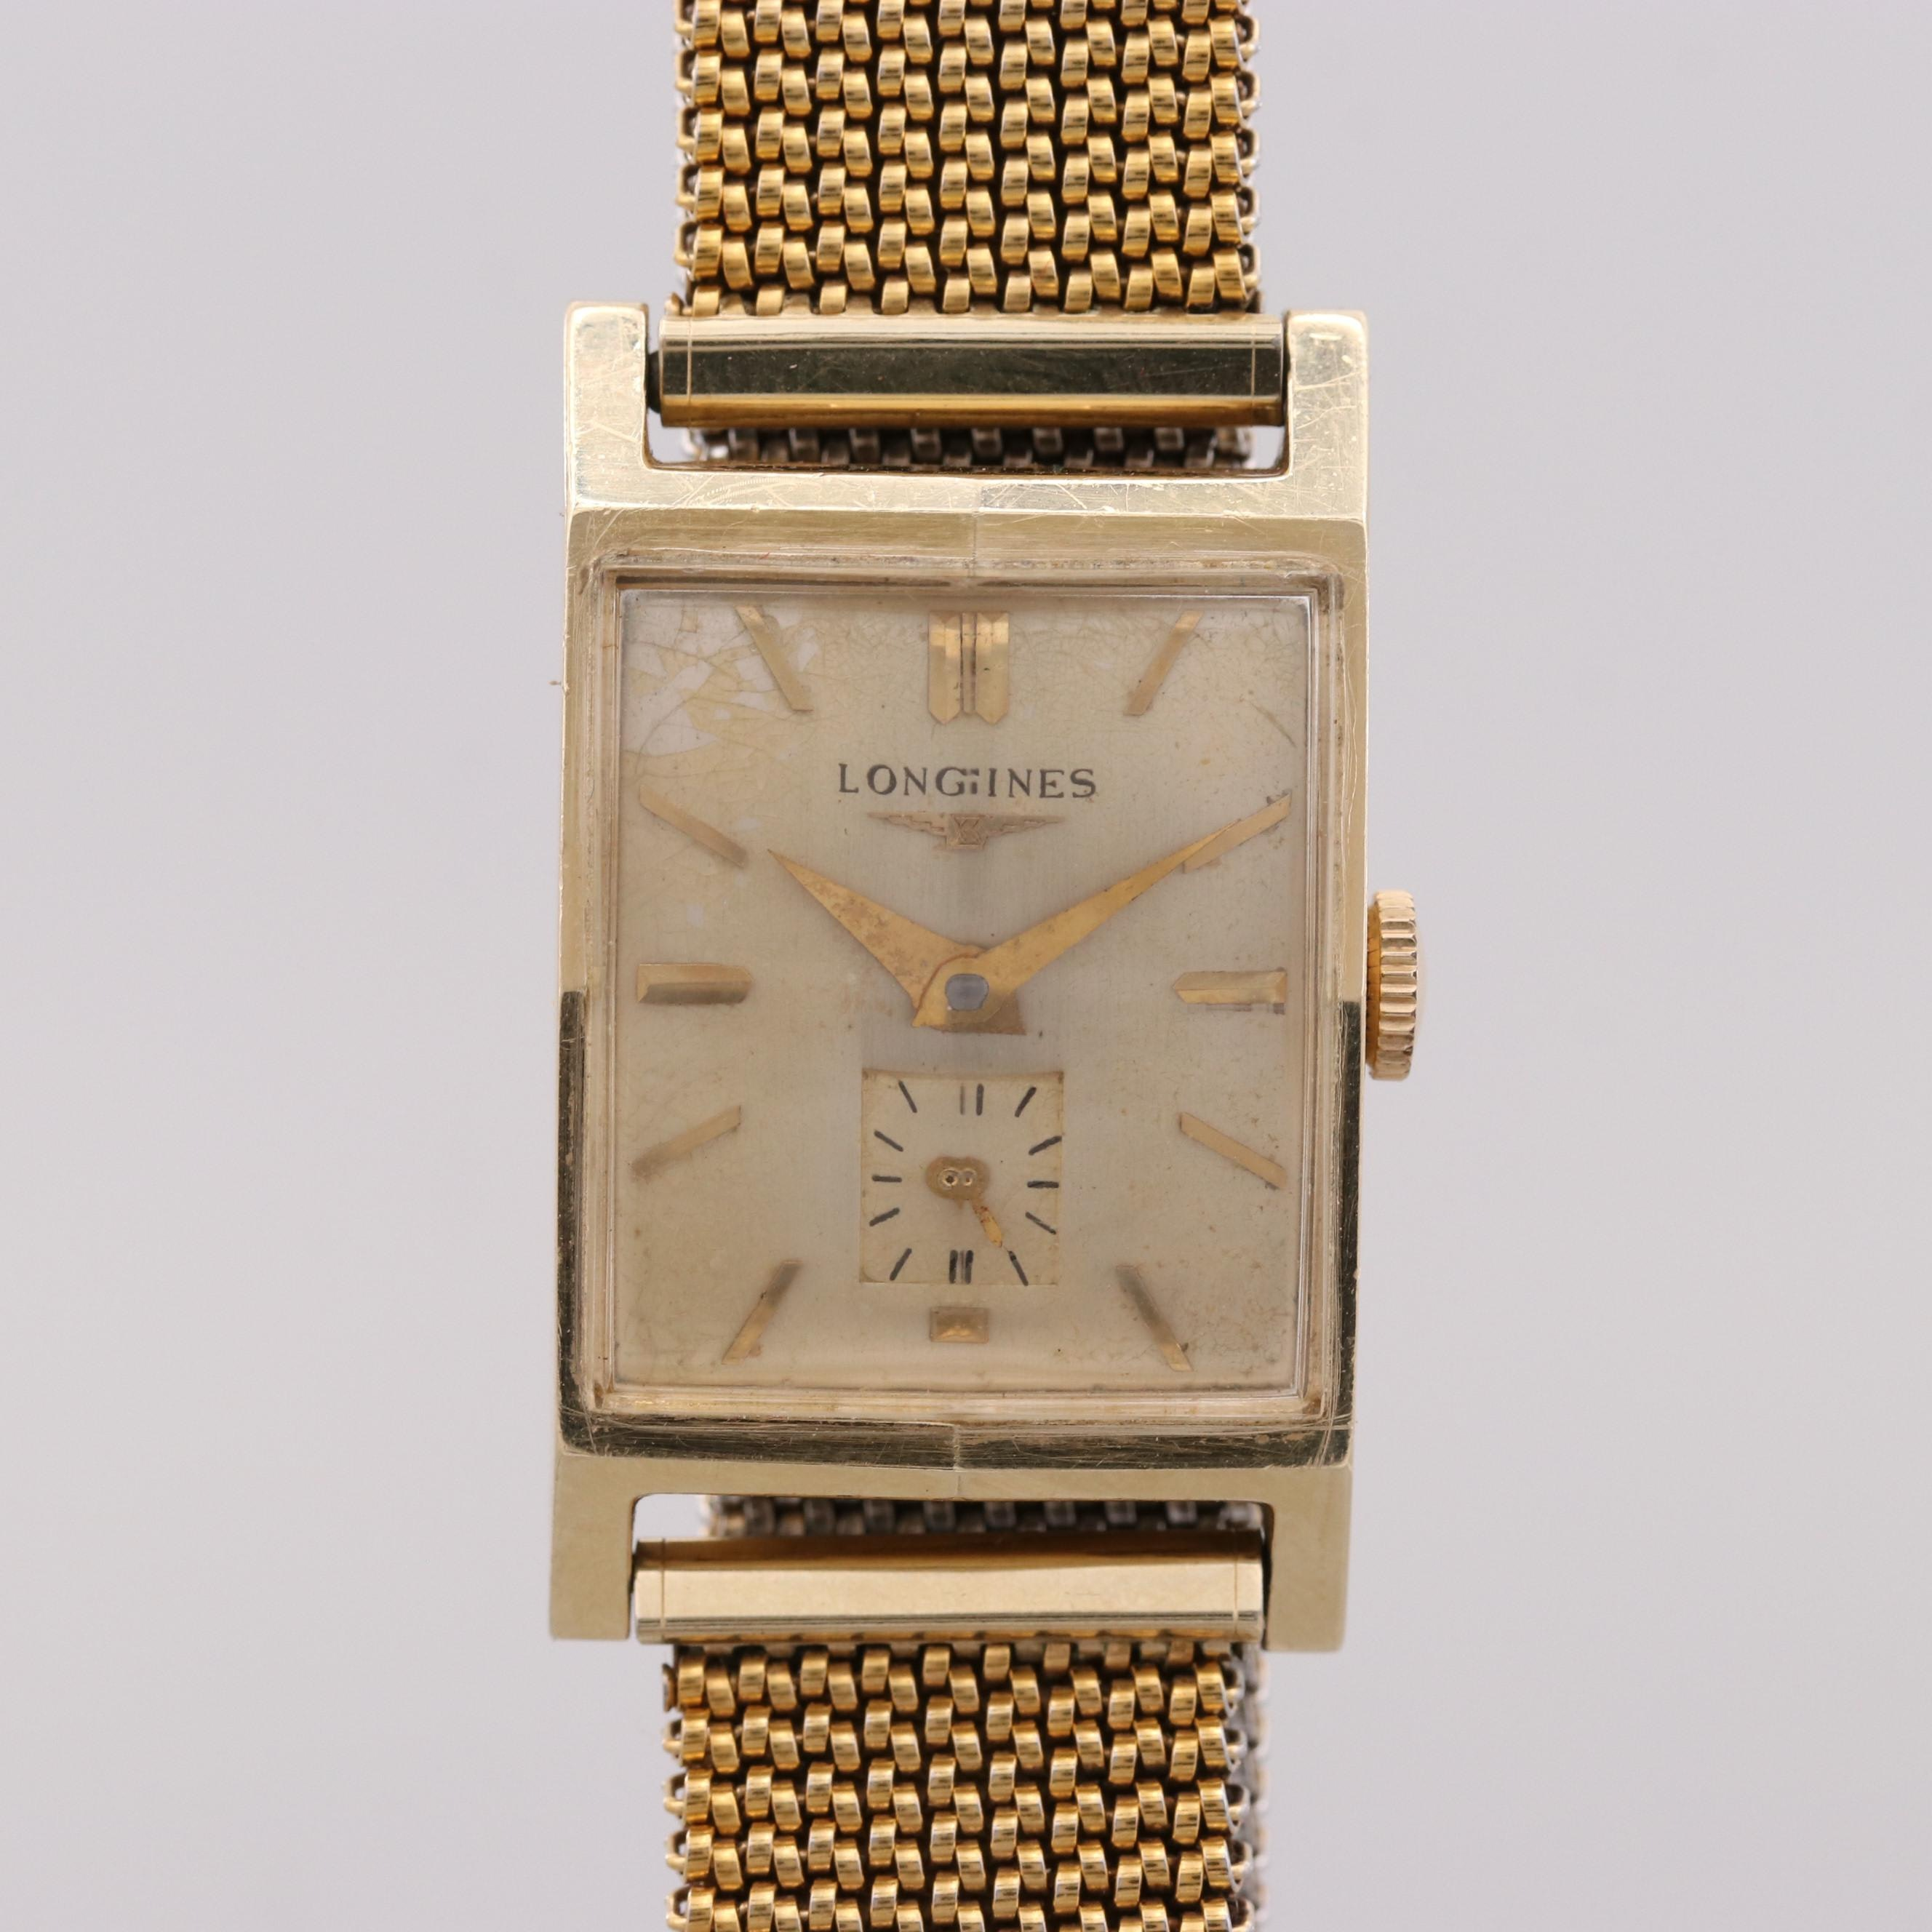 Vintage Longines 14K Yellow Gold Stem Wind Wristwatch